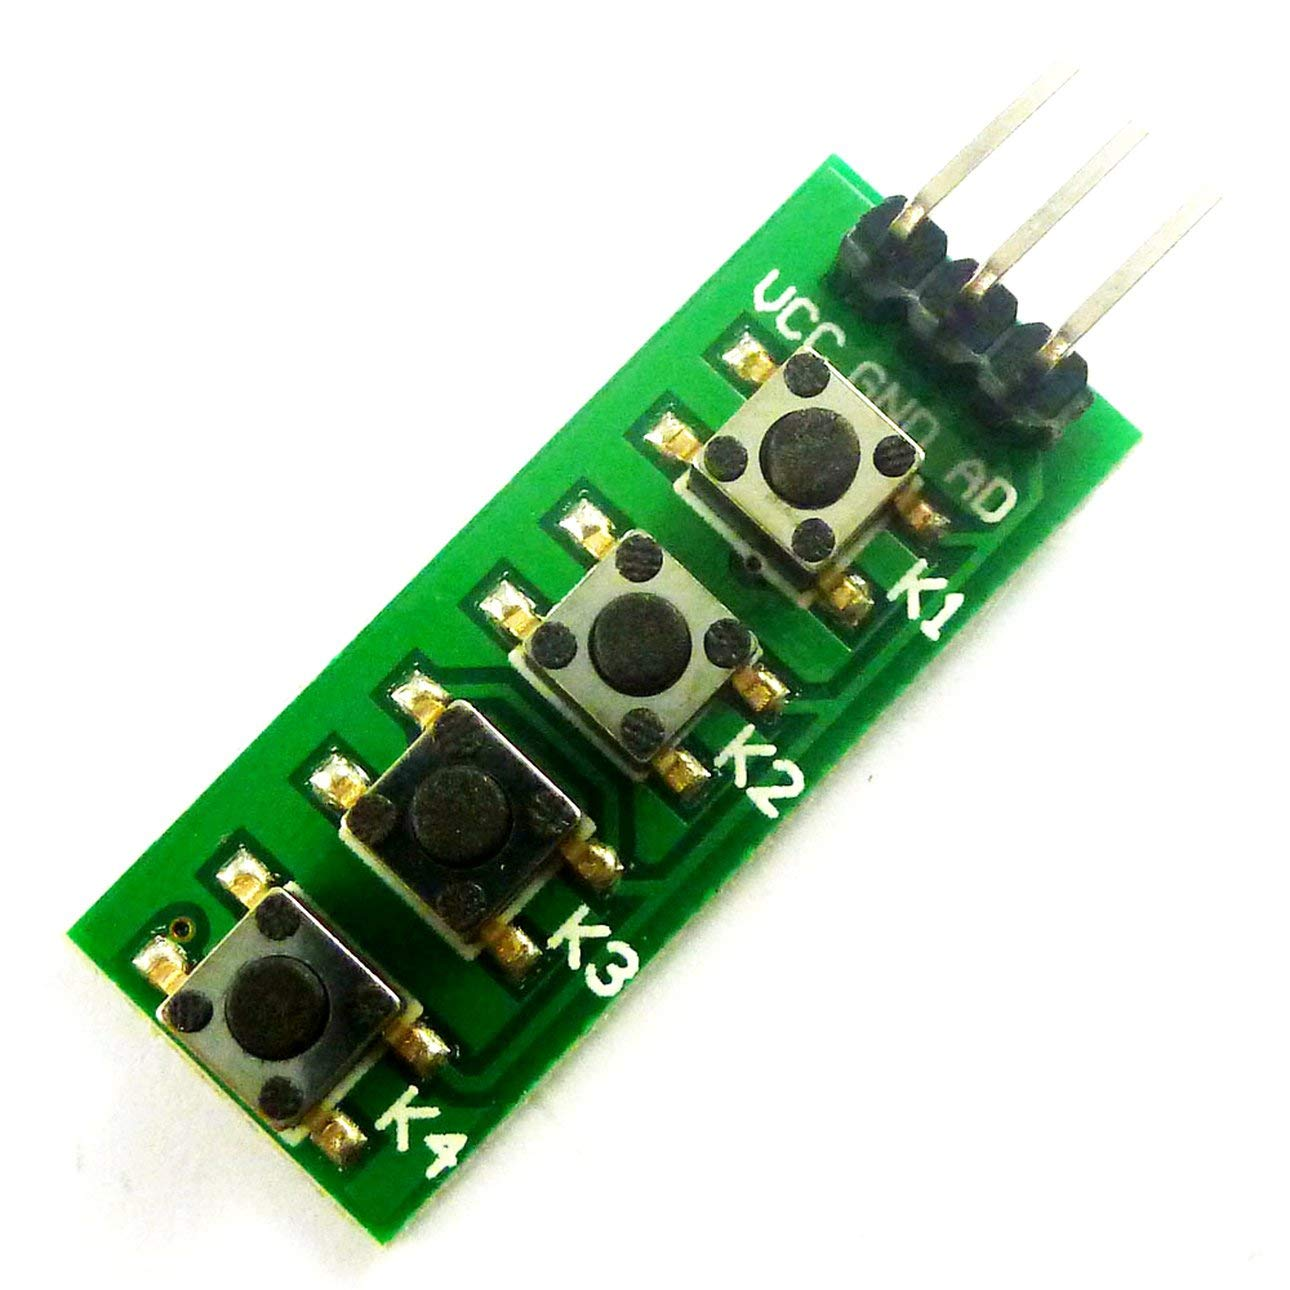 Liobaba Arduino keypad 4 Button Key Module Switch Keyboard for UNO MEGA2560 Breadboard